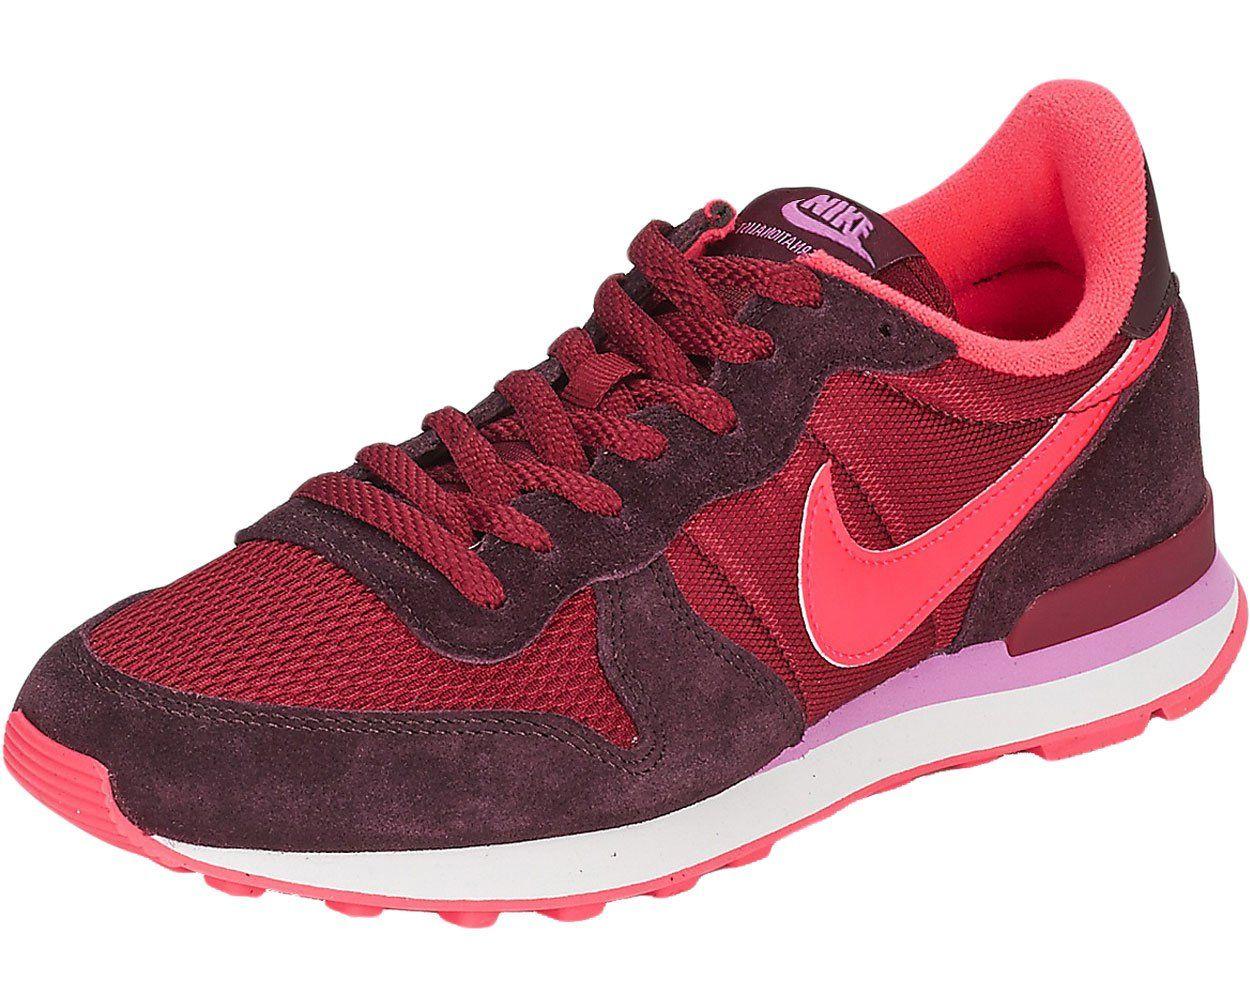 classic authentic quality classic fit NIKE Internationalist Sneaker Damen: Amazon.de: Schuhe ...